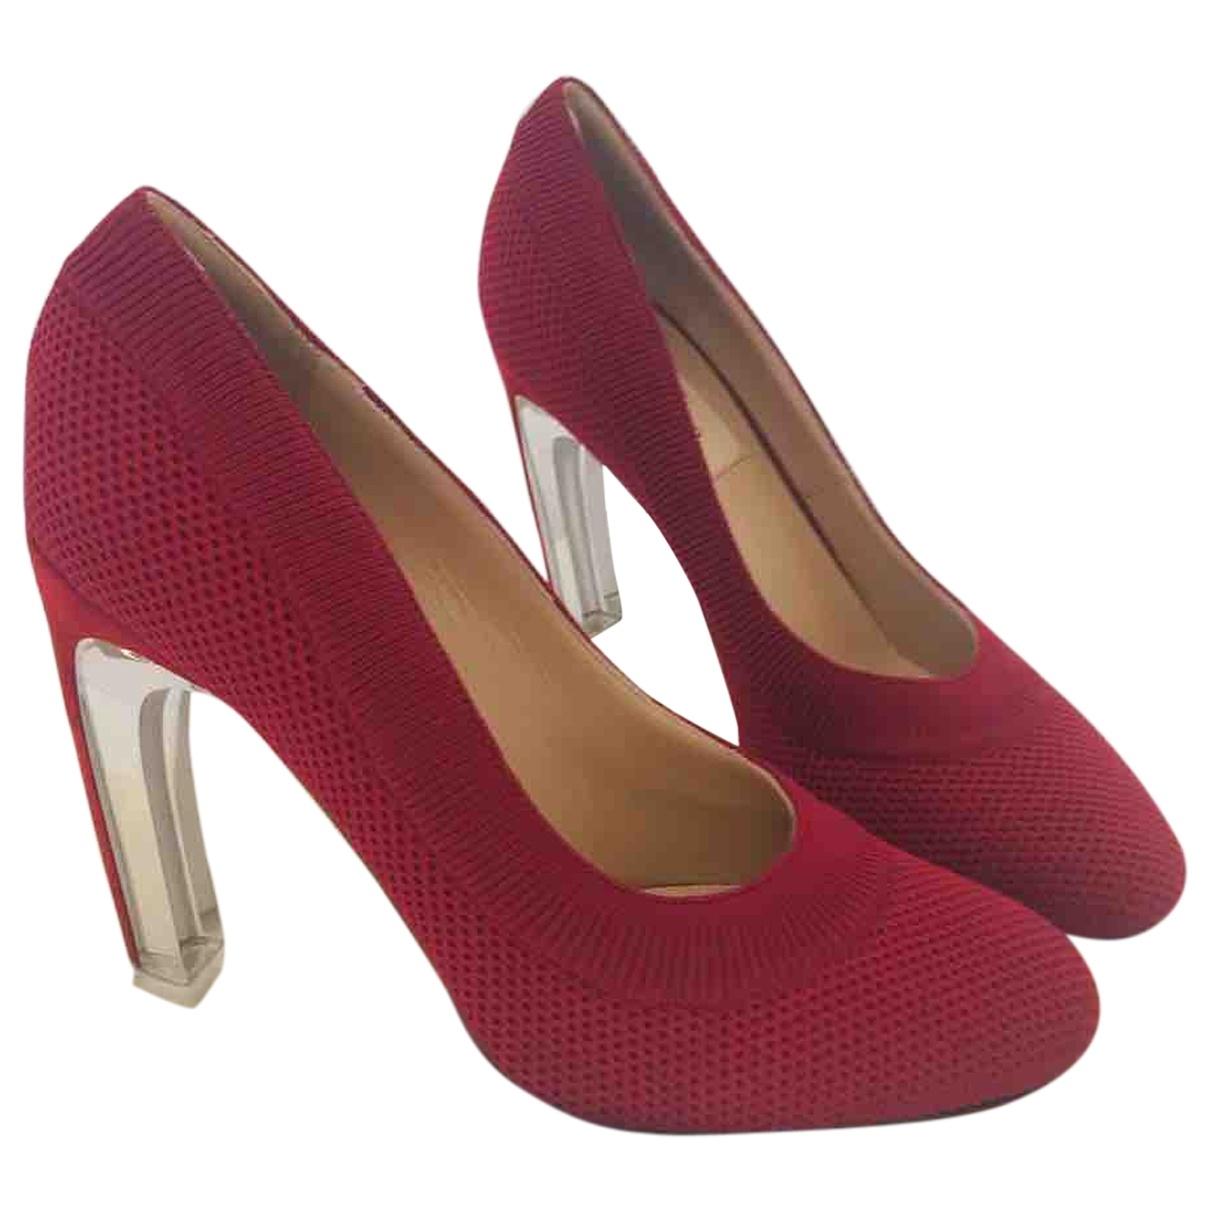 Valentino Garavani \N Burgundy Cloth Heels for Women 37 EU